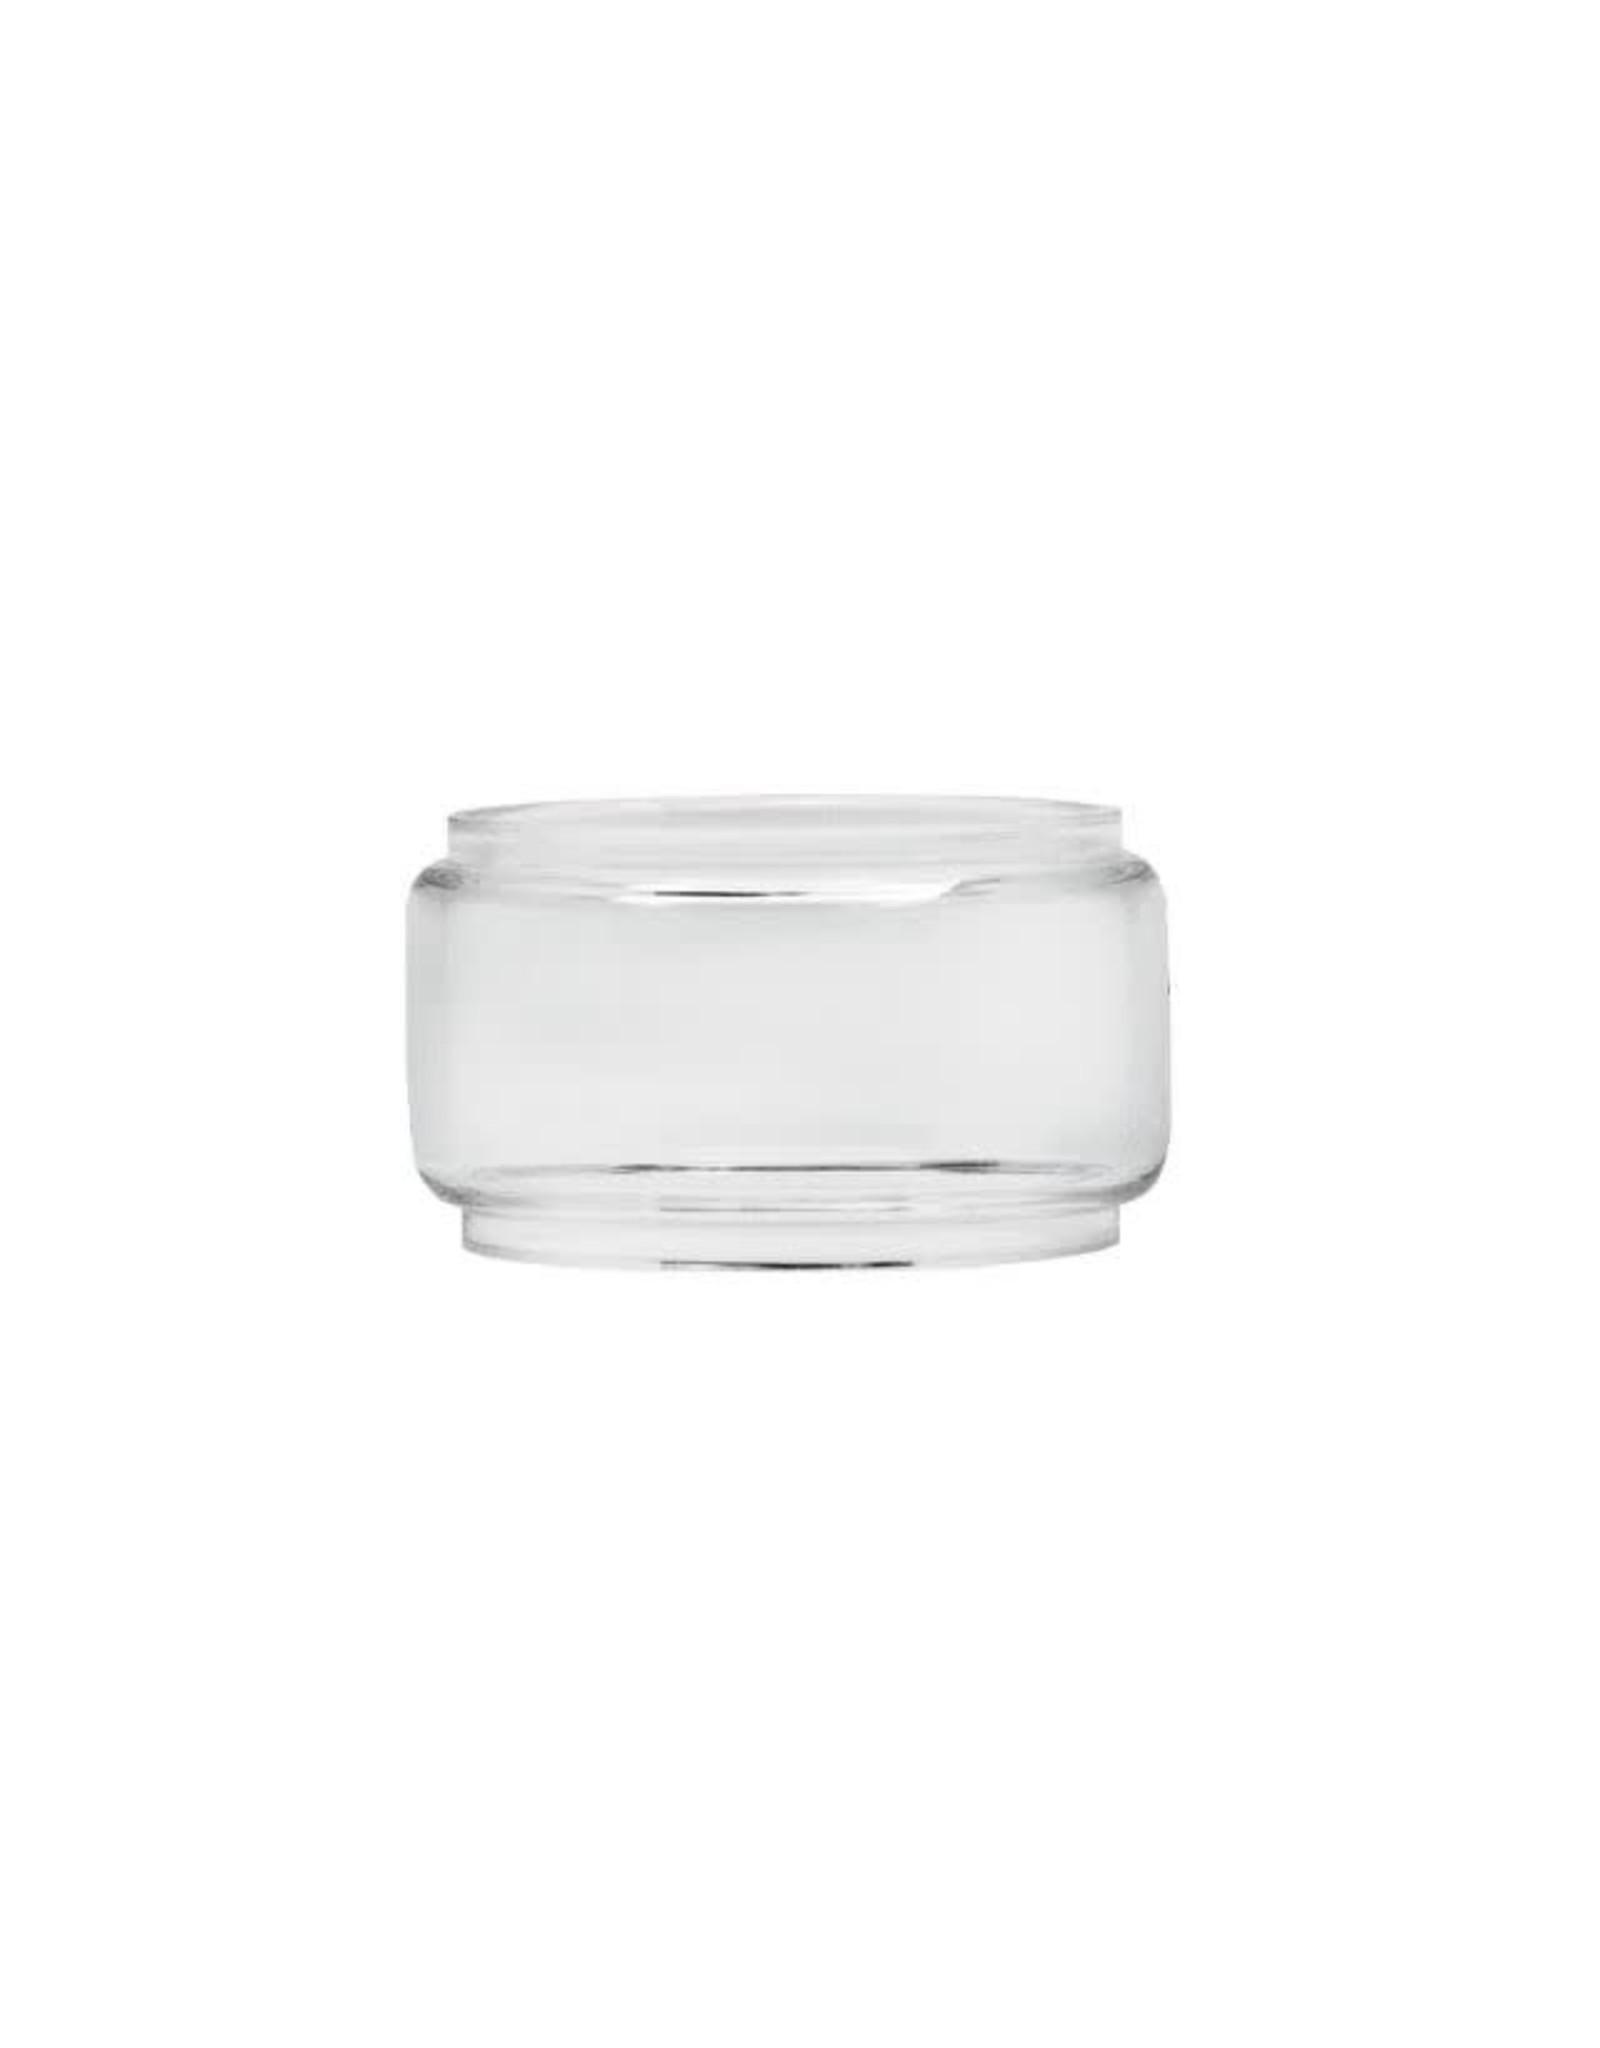 GeekVape Cerebrus replacement glass